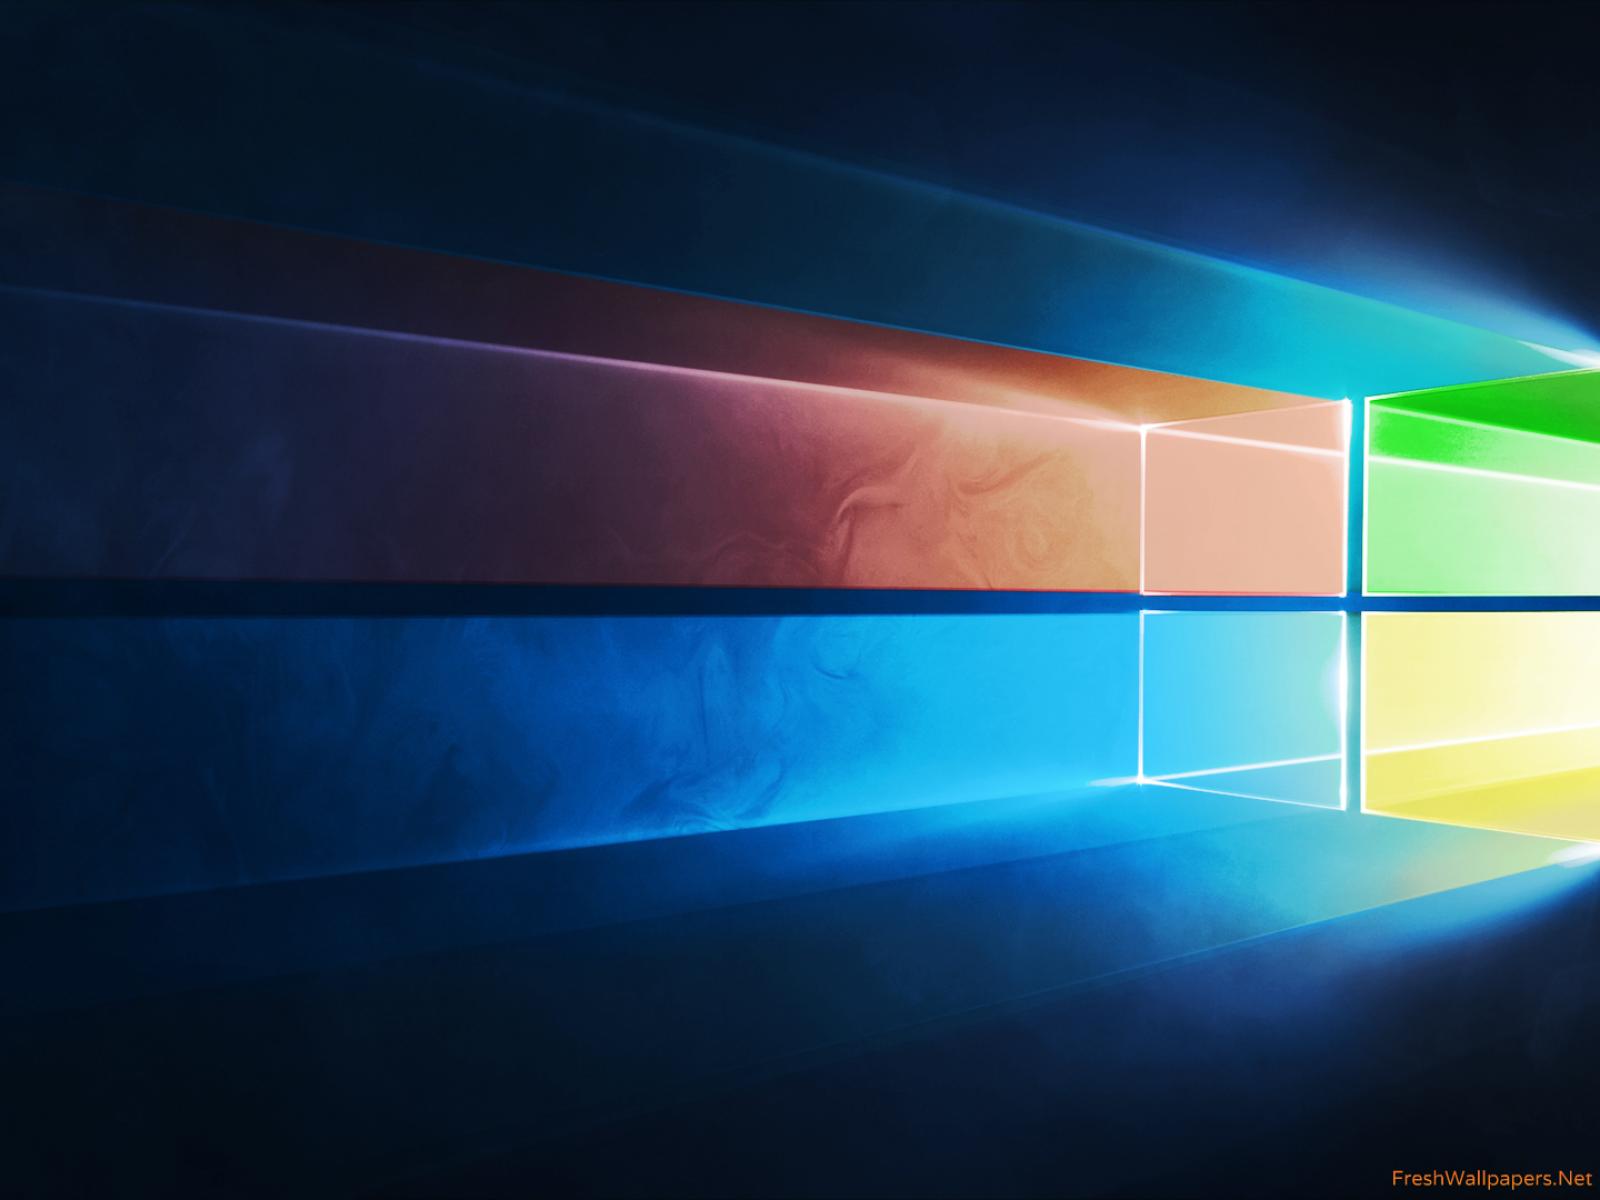 Windows 10 1080p Wallpapers Wallpaper HD Desktop 1600x1200 px 2.13 MB   Imagens bonitas ...